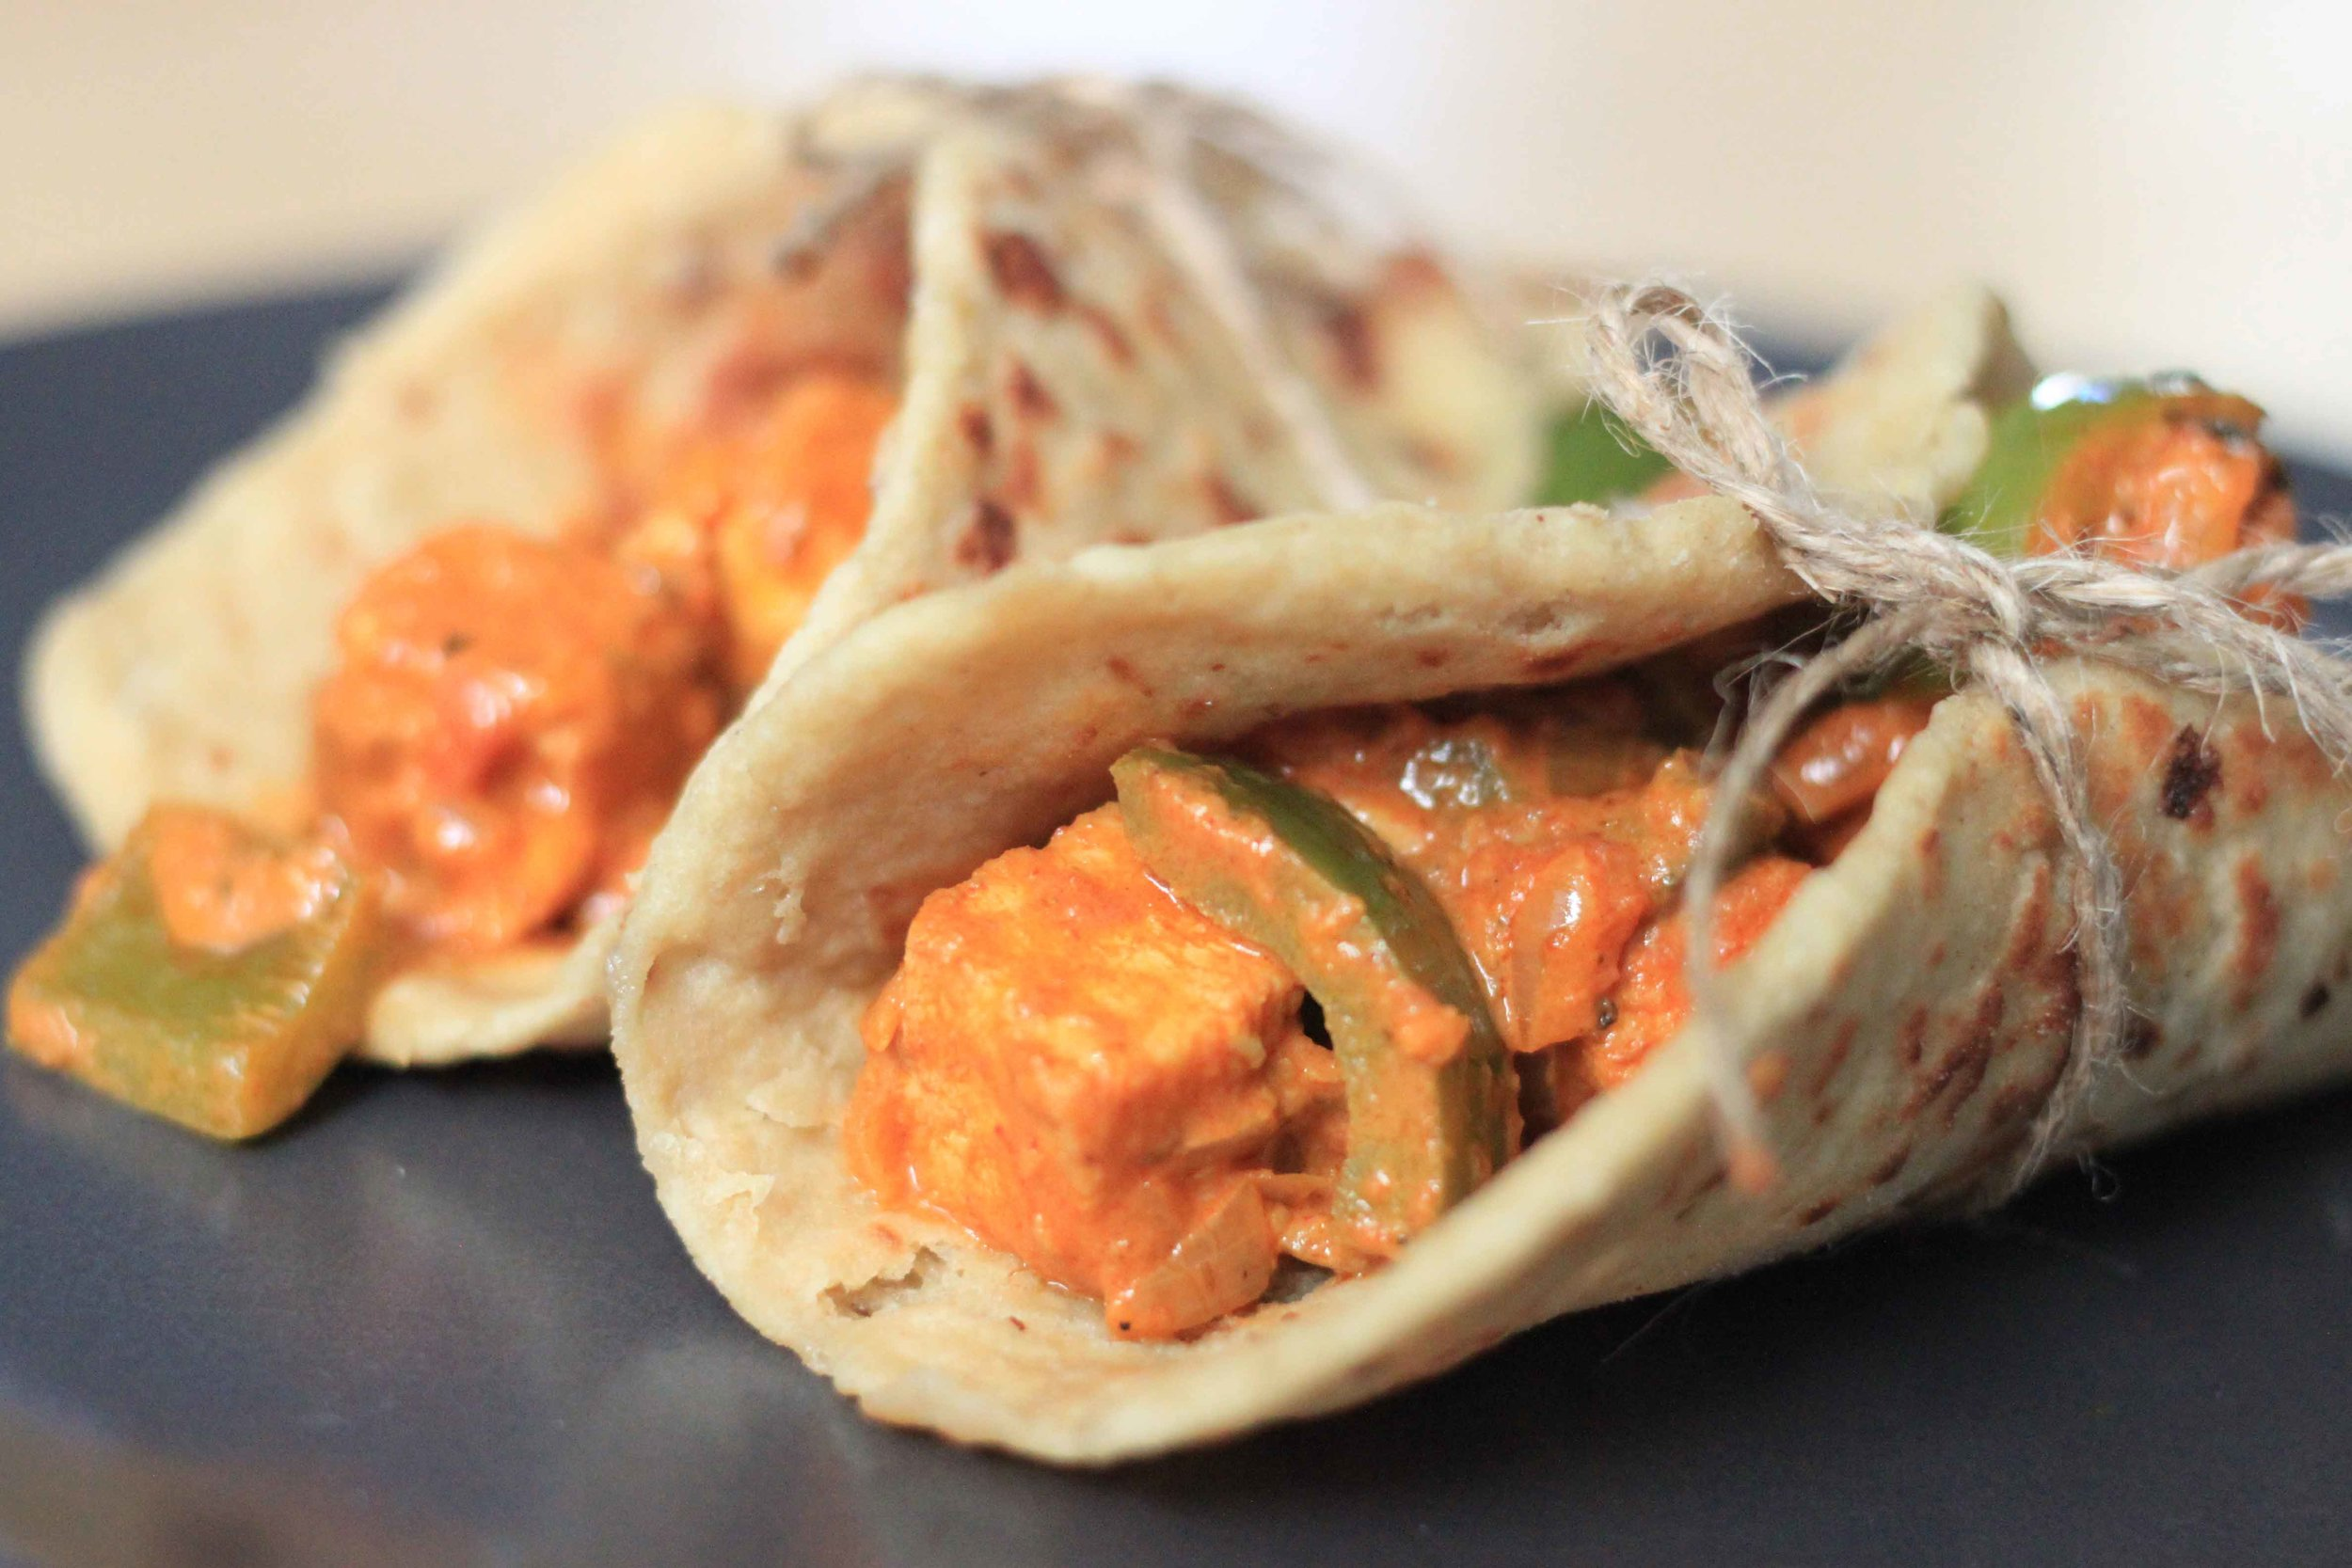 tava paneer kati roll recipe vegetarian low carb indian charisma shah